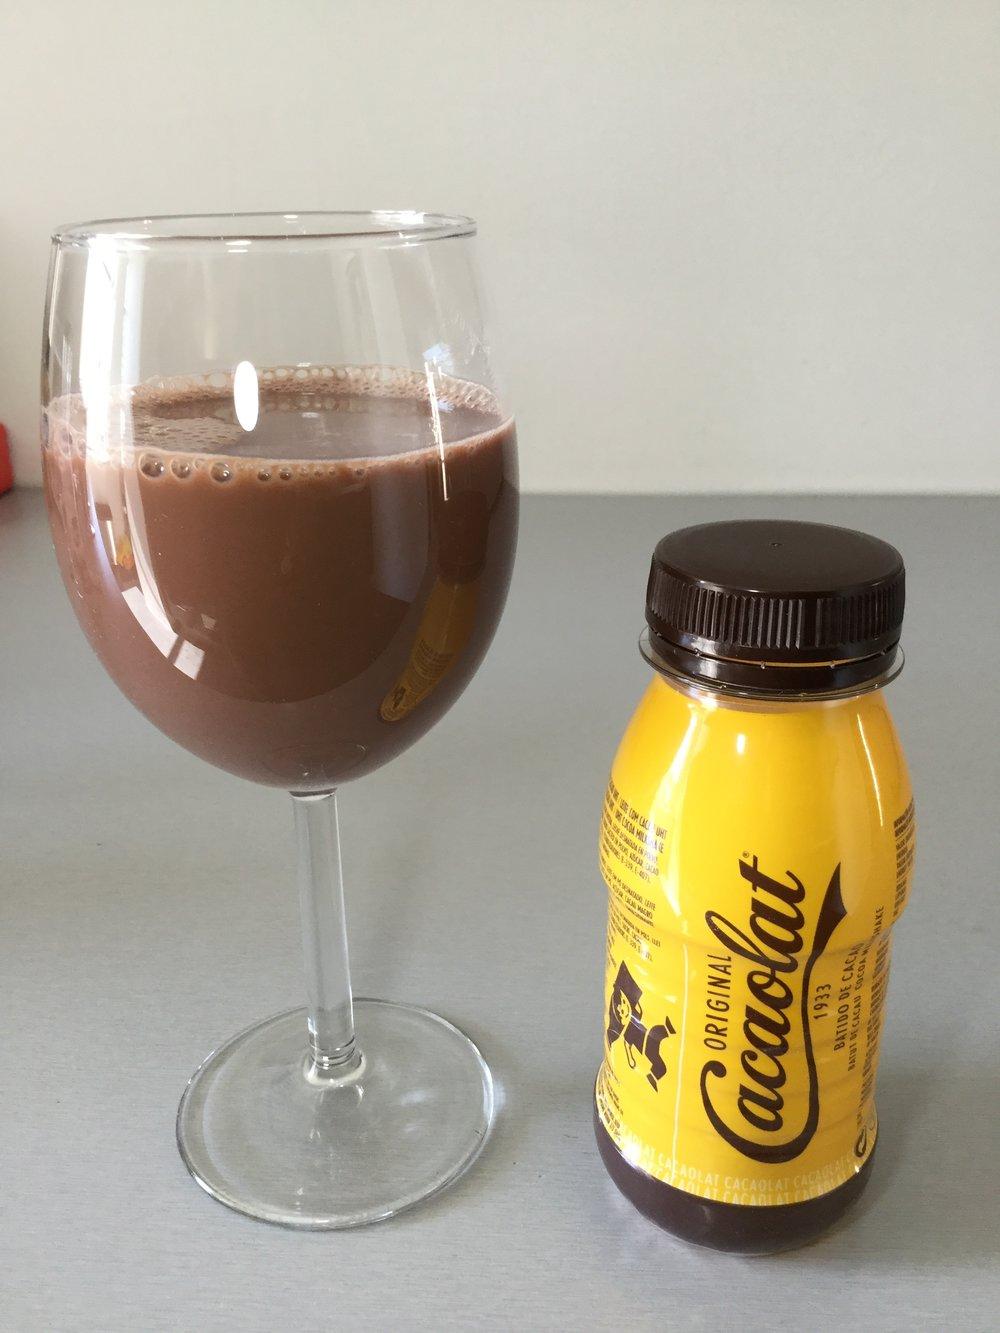 Cacaolat Original Batido De Cacao Cup